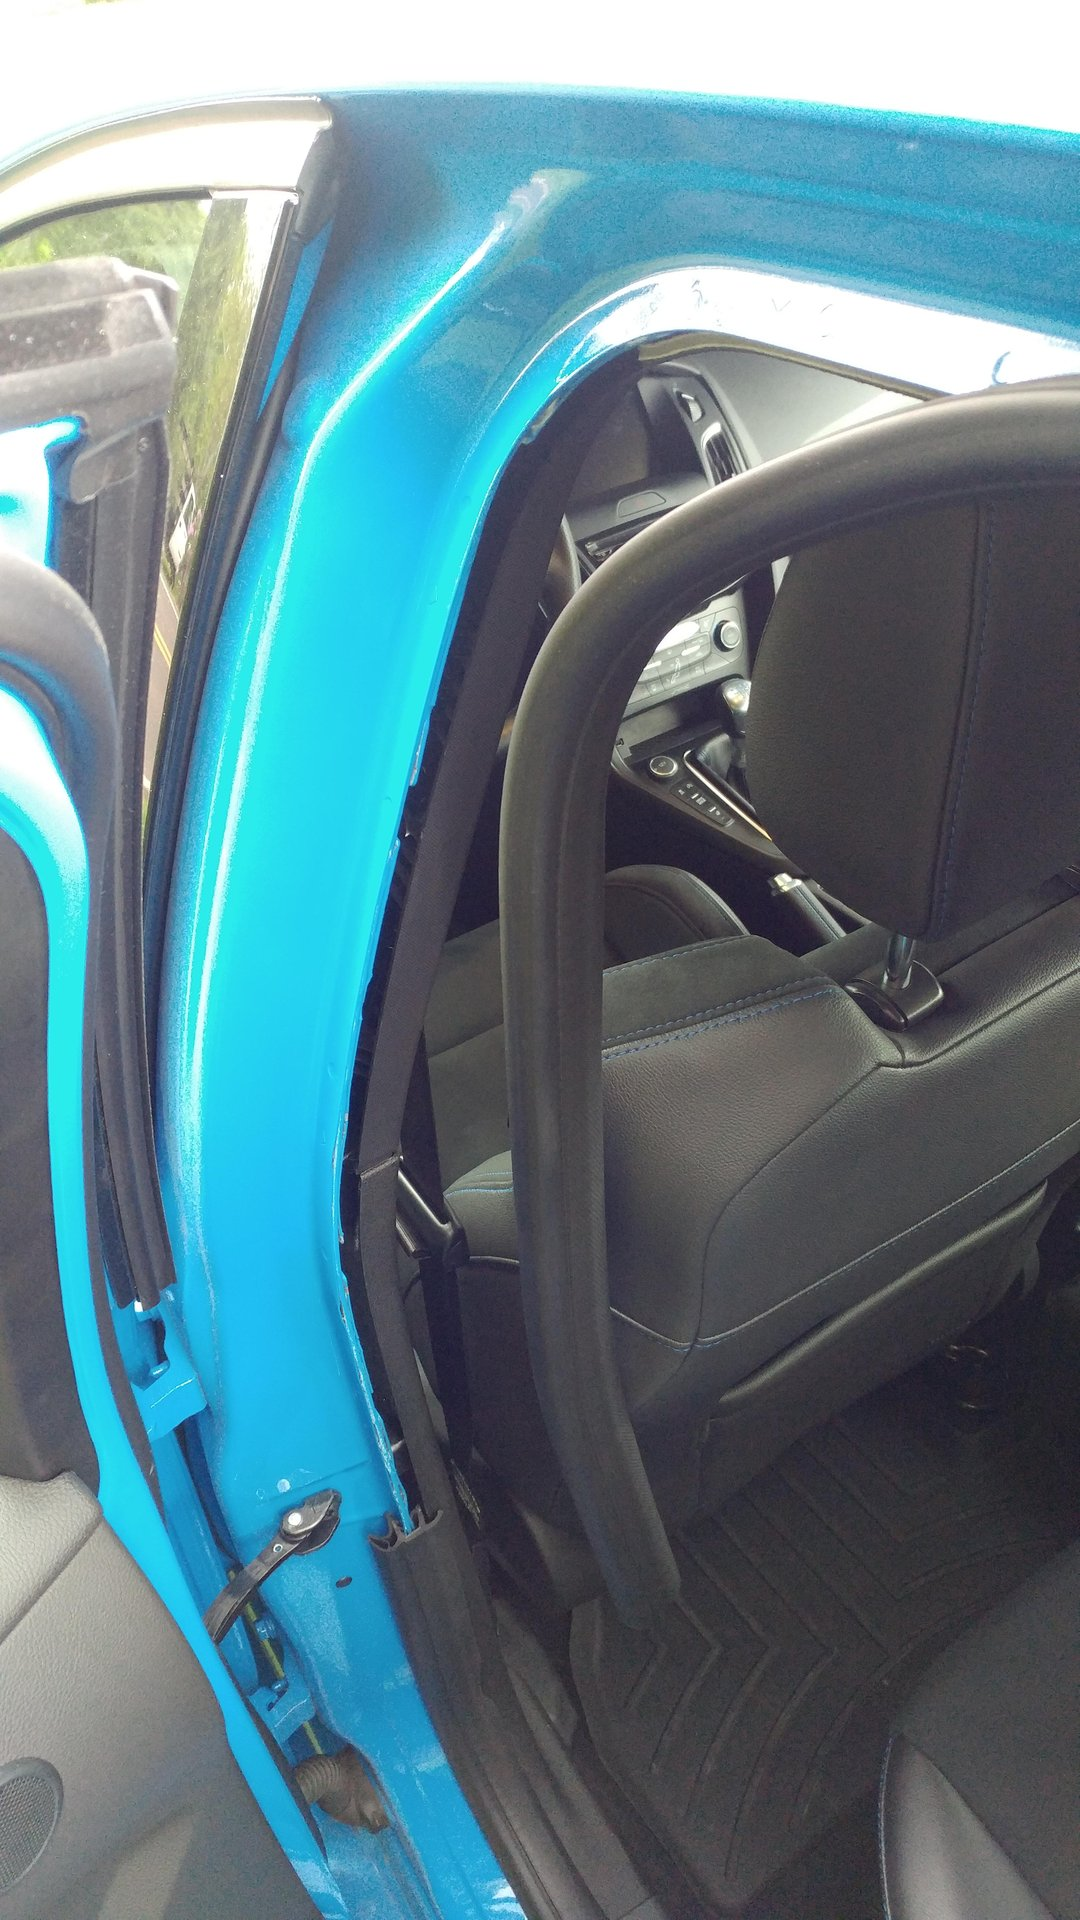 Seatbelt adjuster rattle (DIY fix) | Ford Focus RS Forum